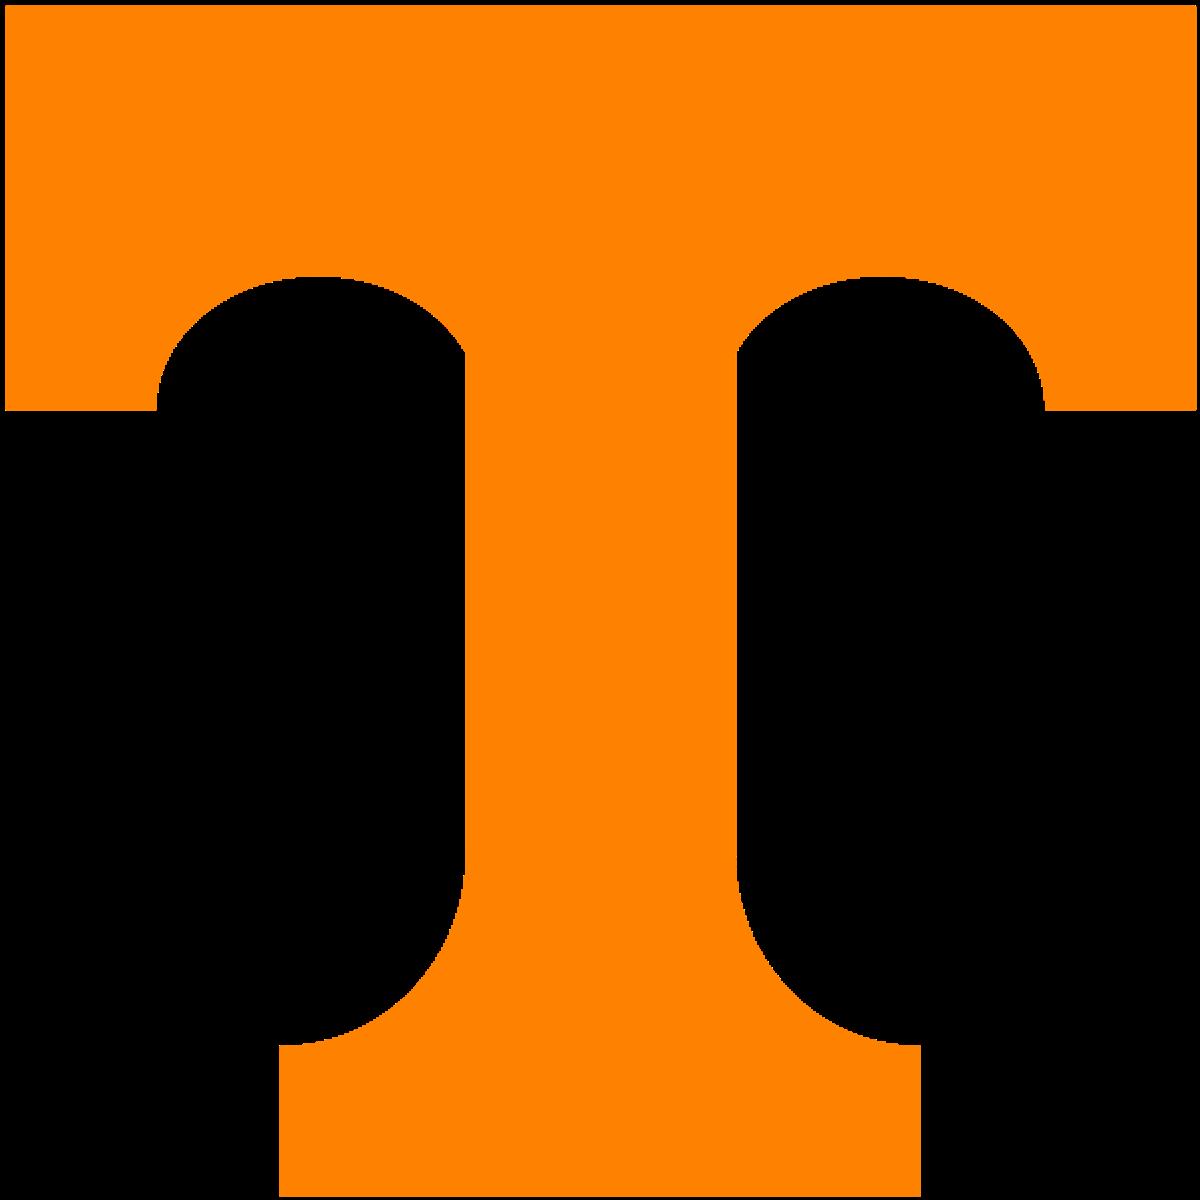 Regional briefs: Two leave Tennessee football program